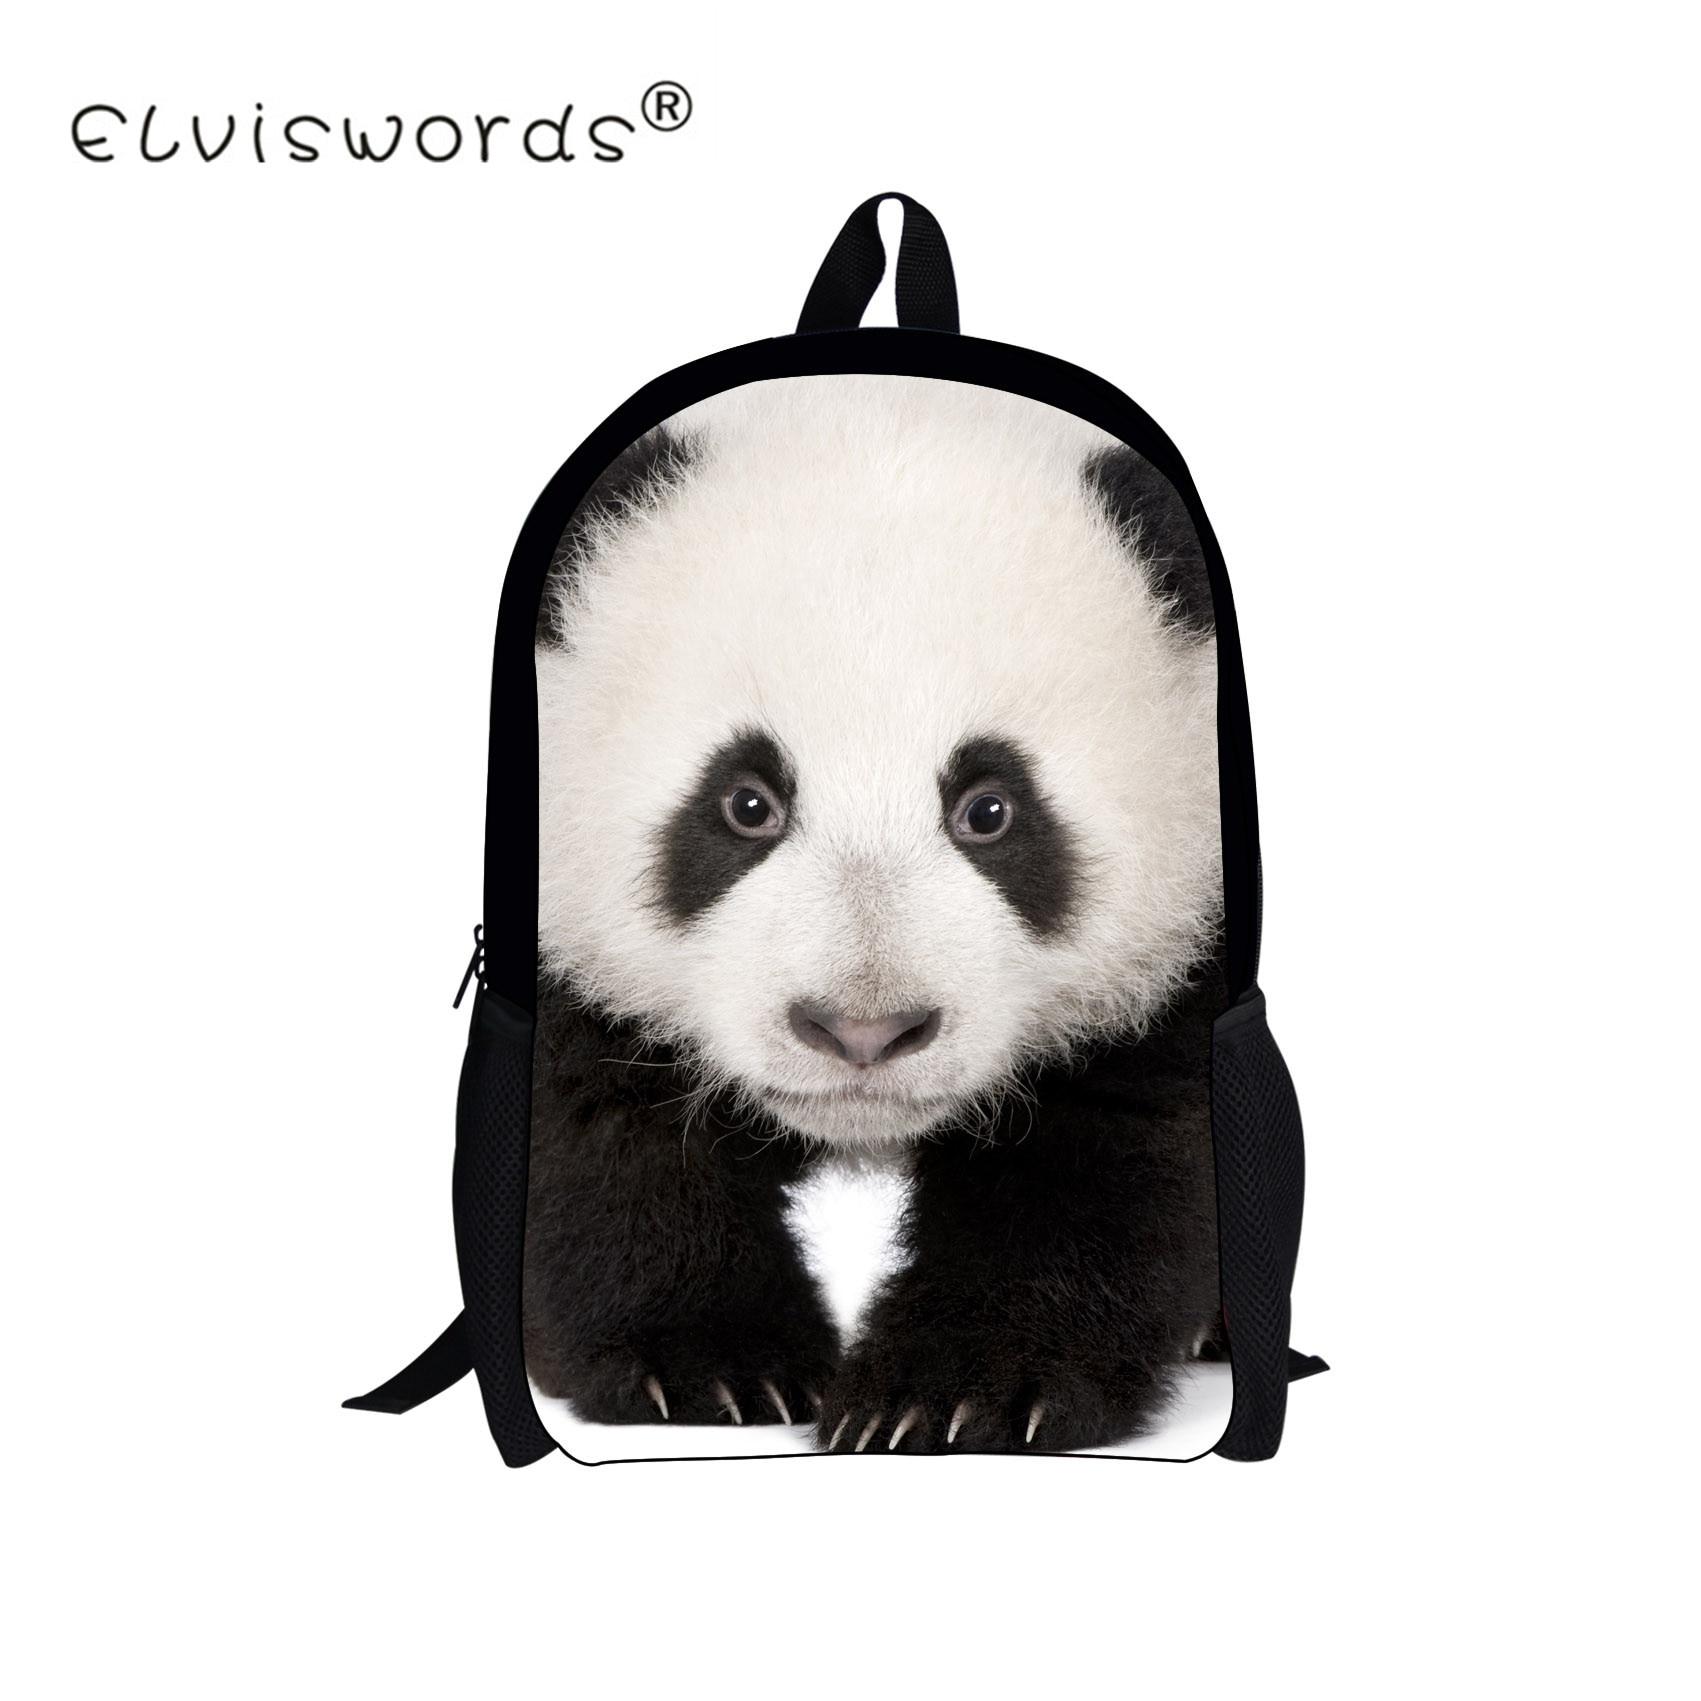 ELVISWORDS Animal Zoo Children Student School Bags for Teenager Boys Girls Panda Wolf Women Casual Bag Kids Schoolbag Mochila